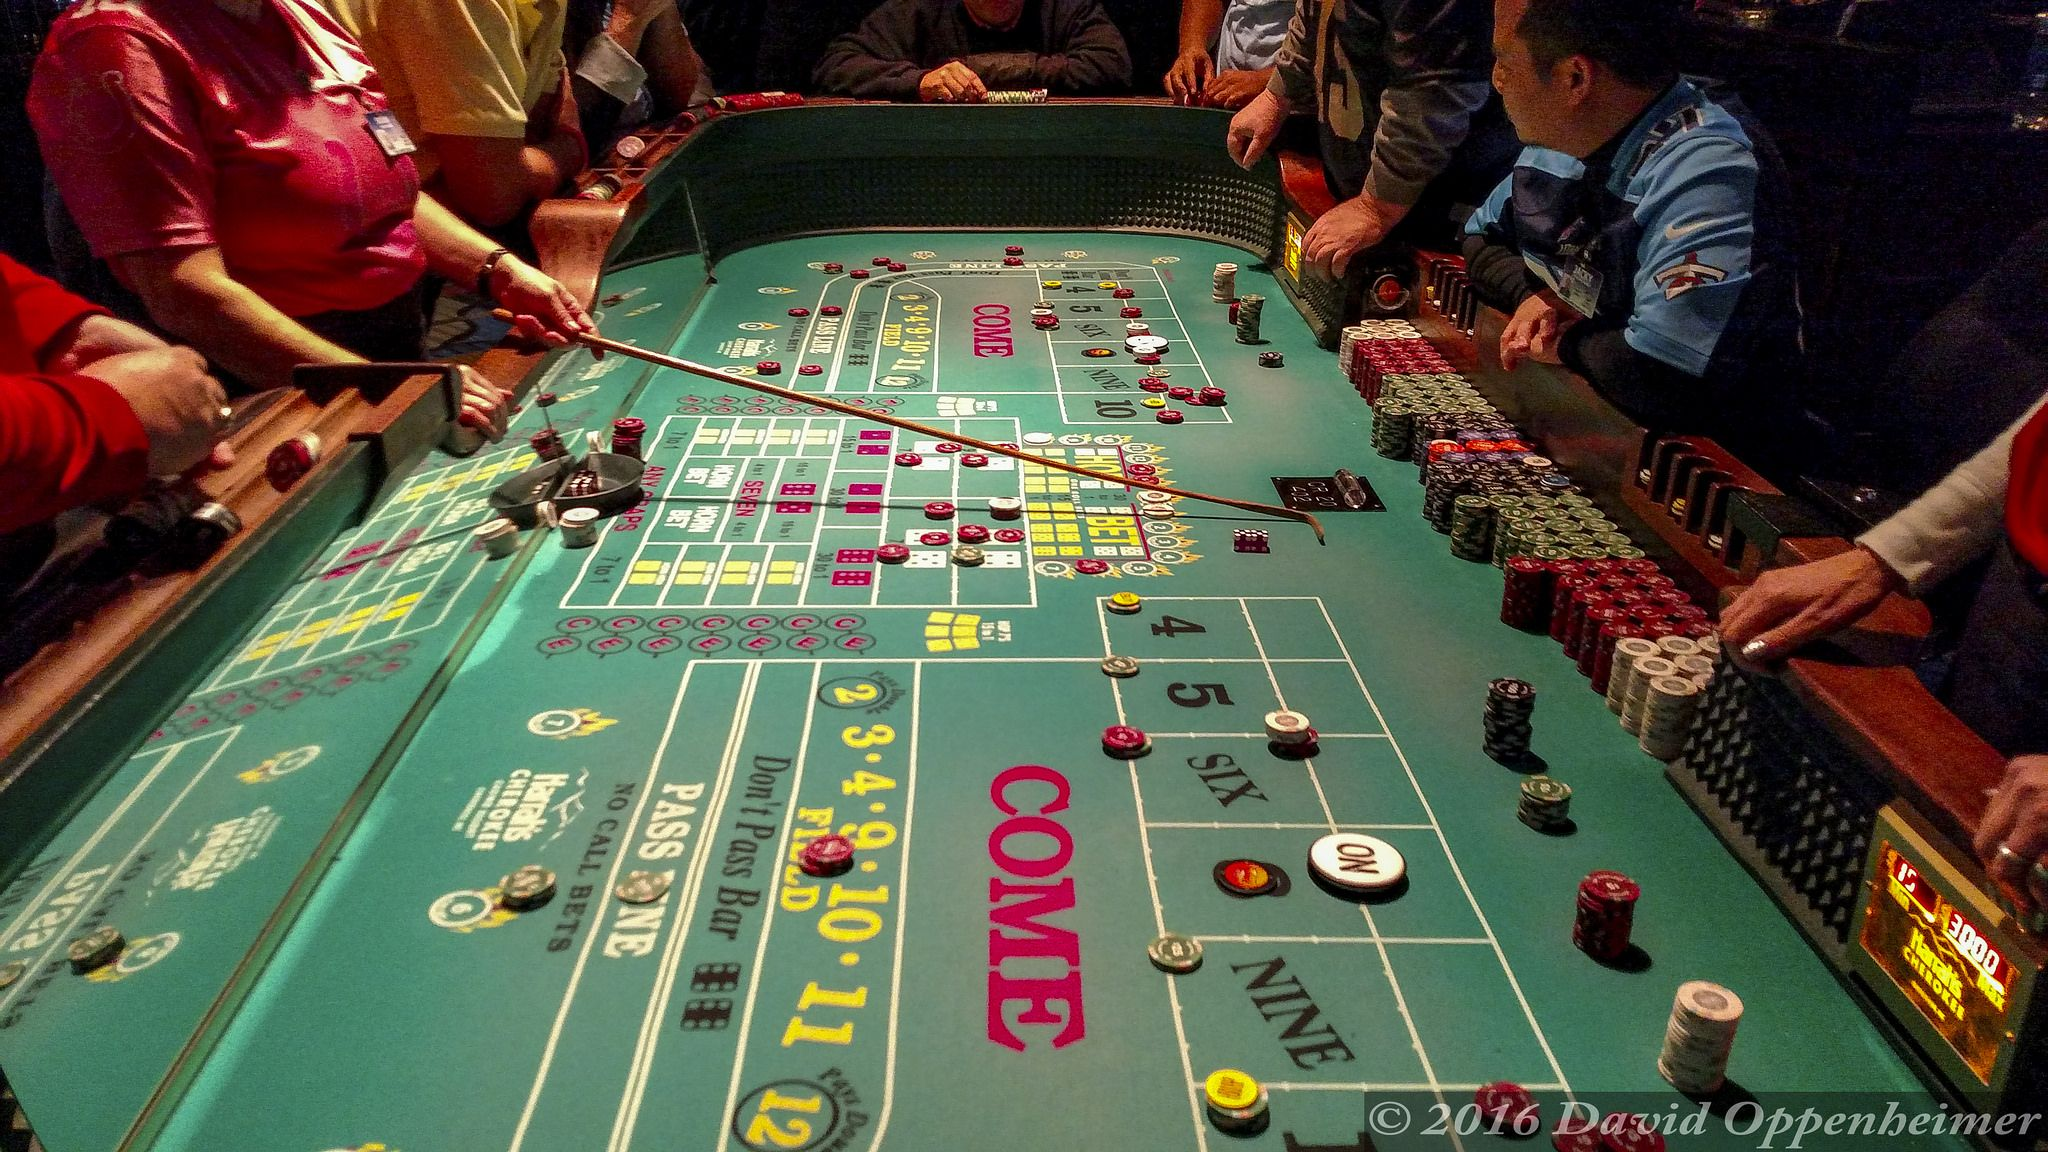 San manuel blackjack tournament